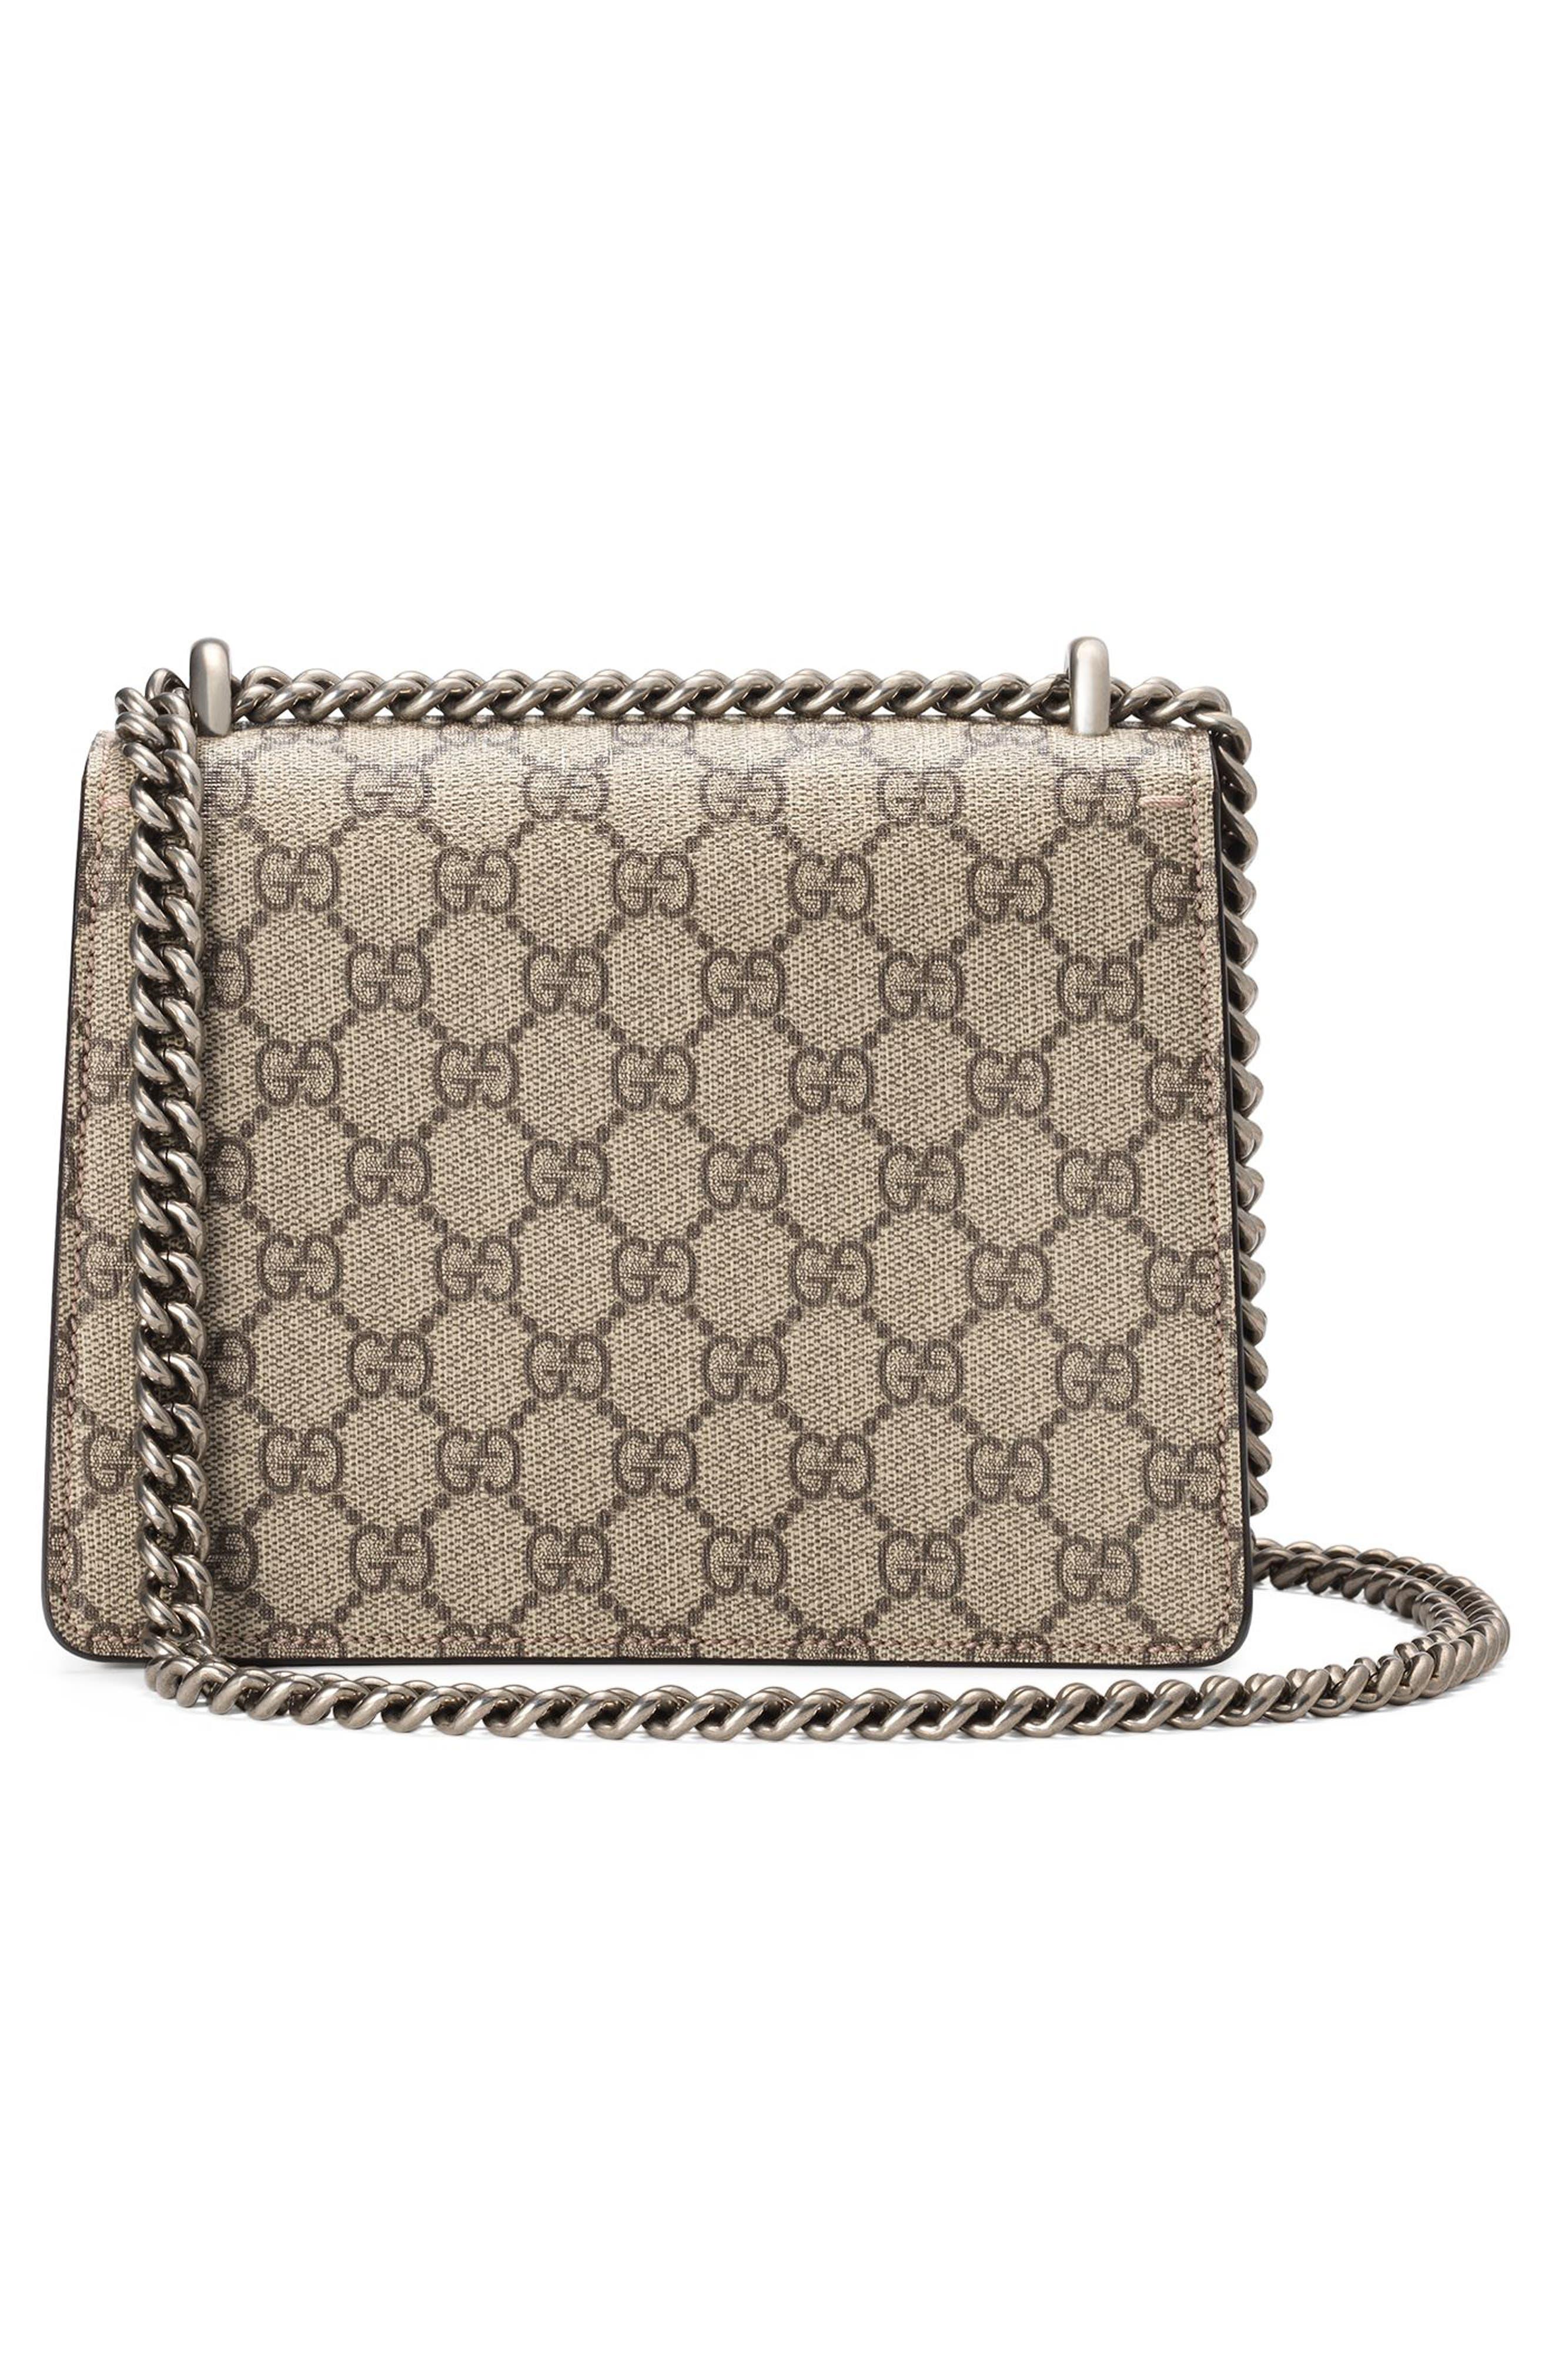 Alternate Image 2  - Gucci Mini Dionysus GG Supreme Shoulder Bag